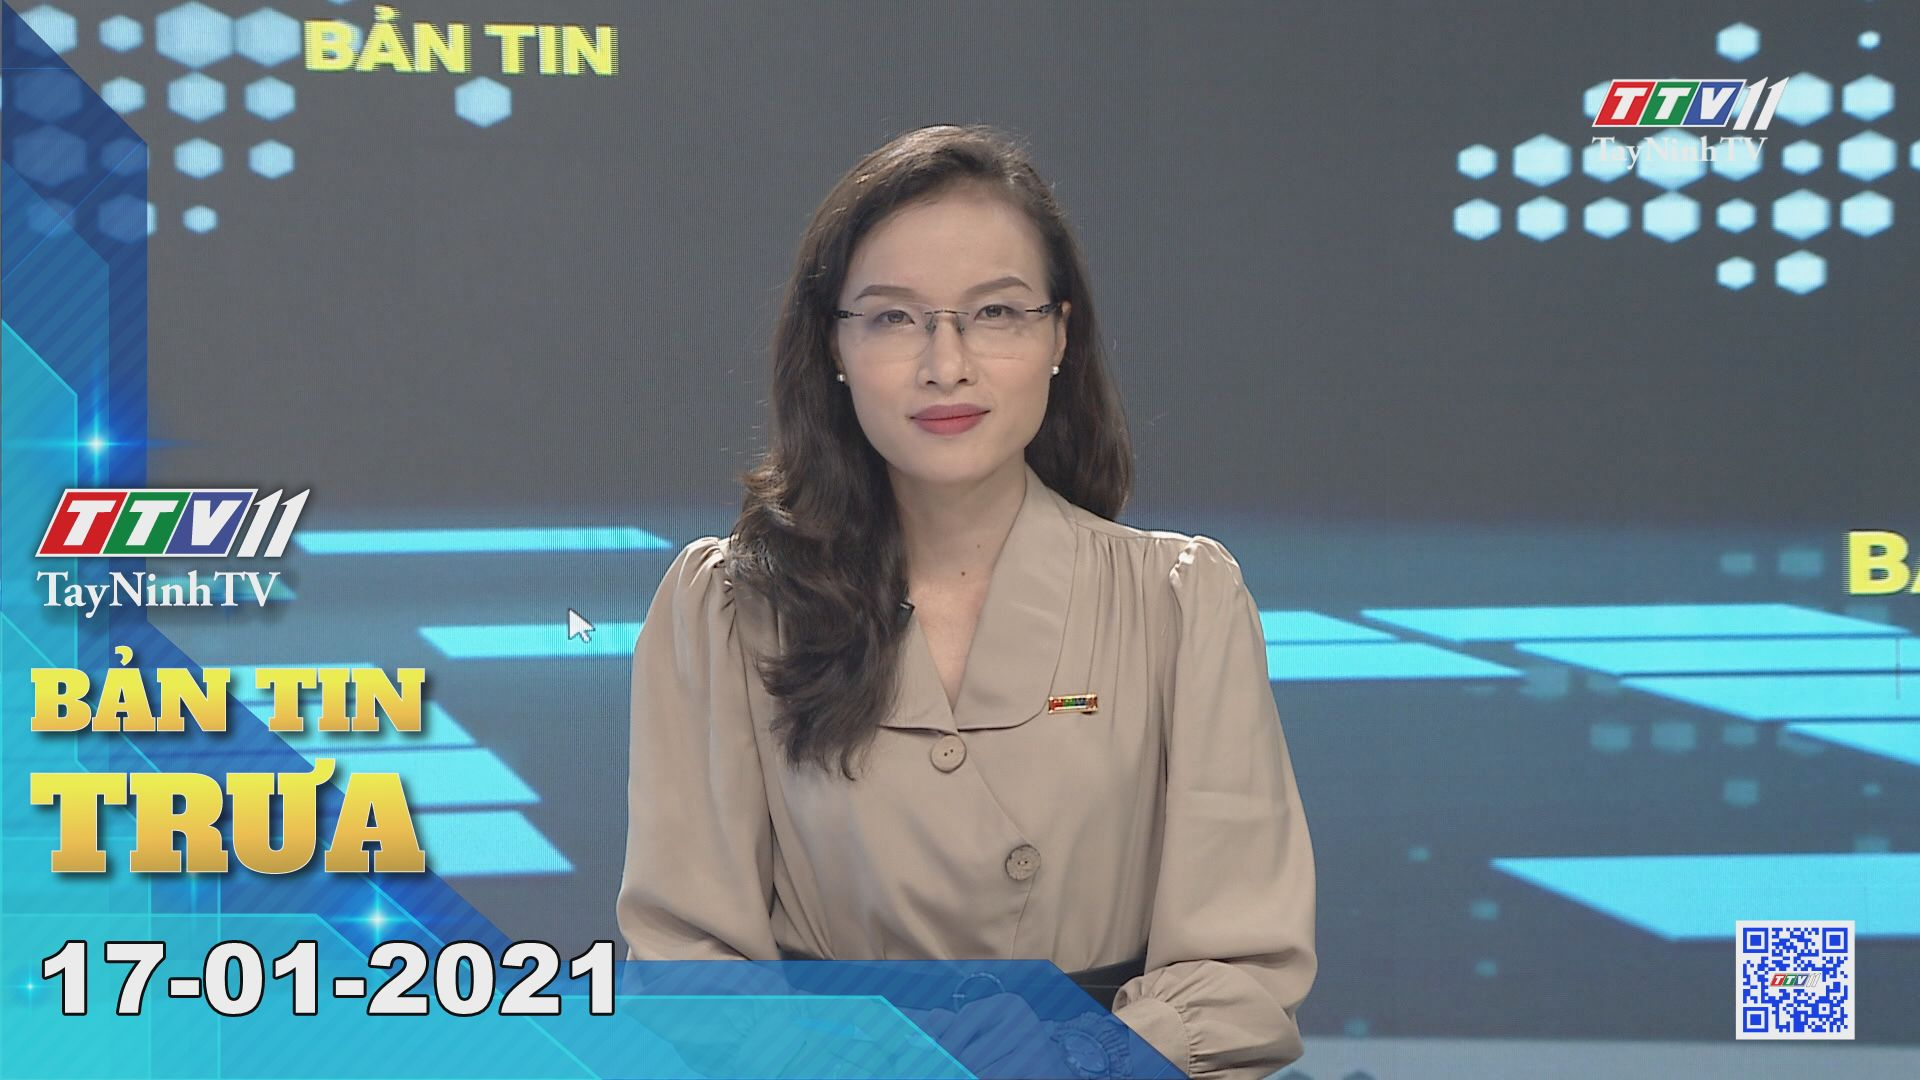 Bản tin trưa 17-01-2021 | Tin tức hôm nay | TayNinhTV